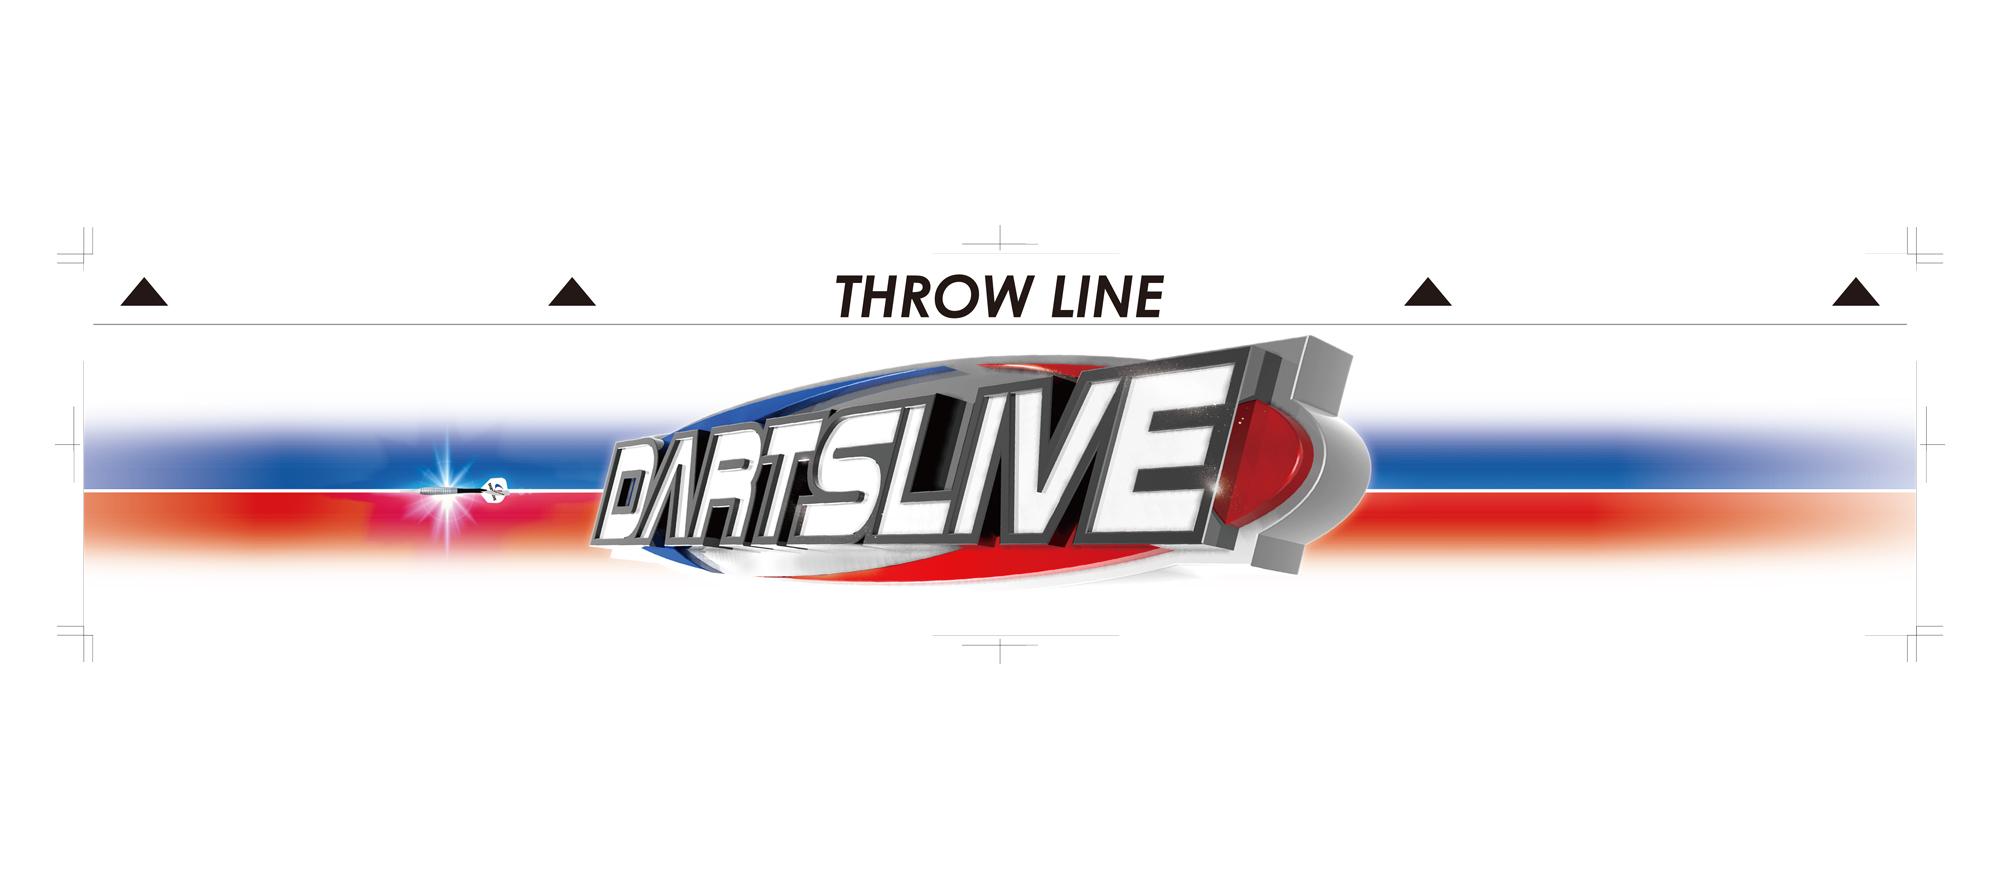 DARTSLIVE2 スローライン【白】